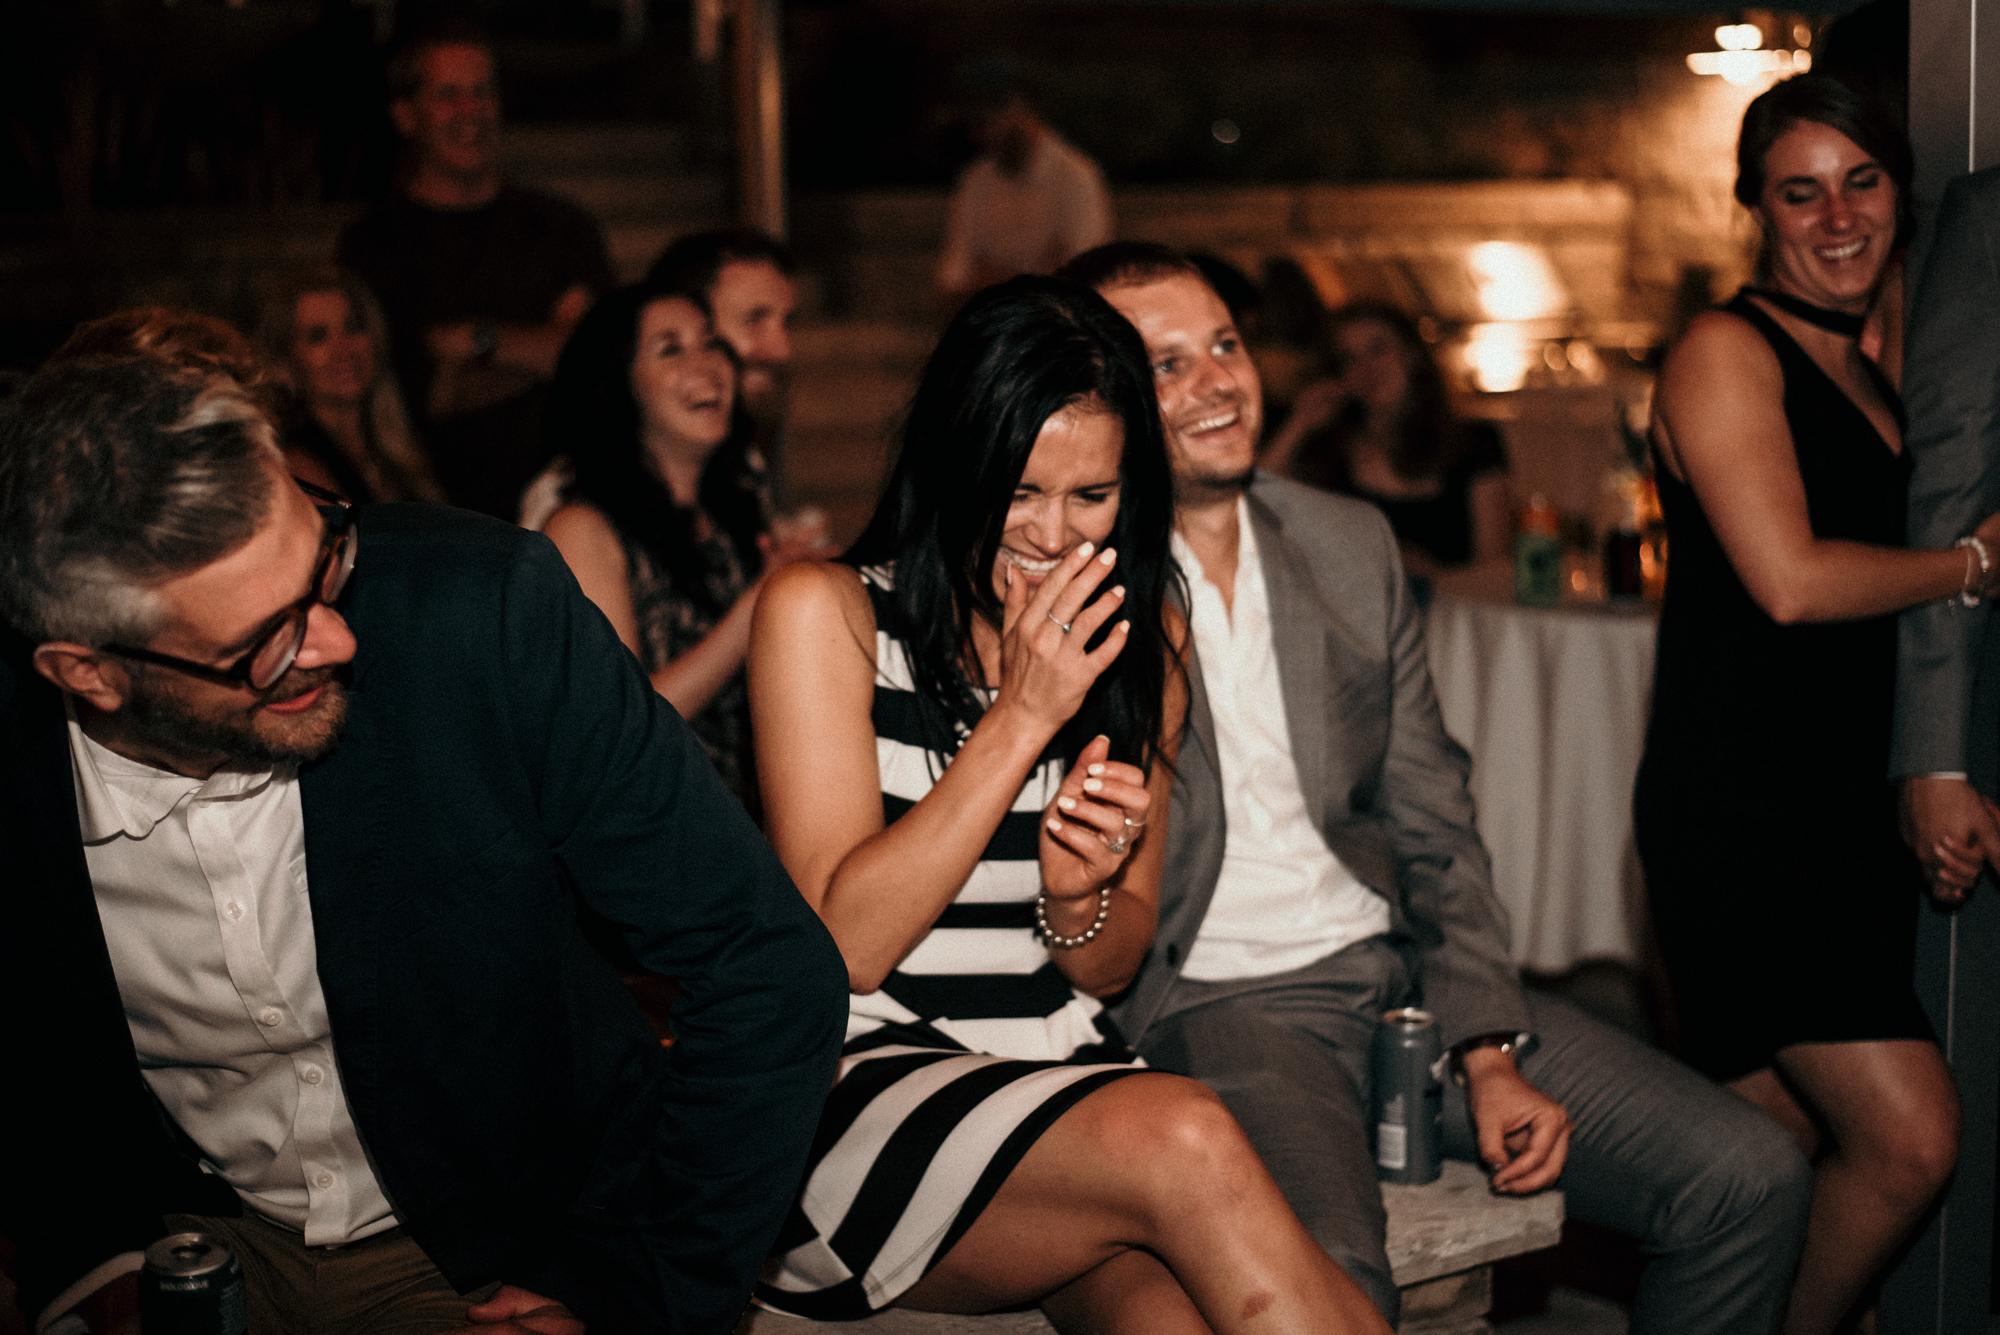 fraser-blog-grand-bend-wedding-2-15.jpg